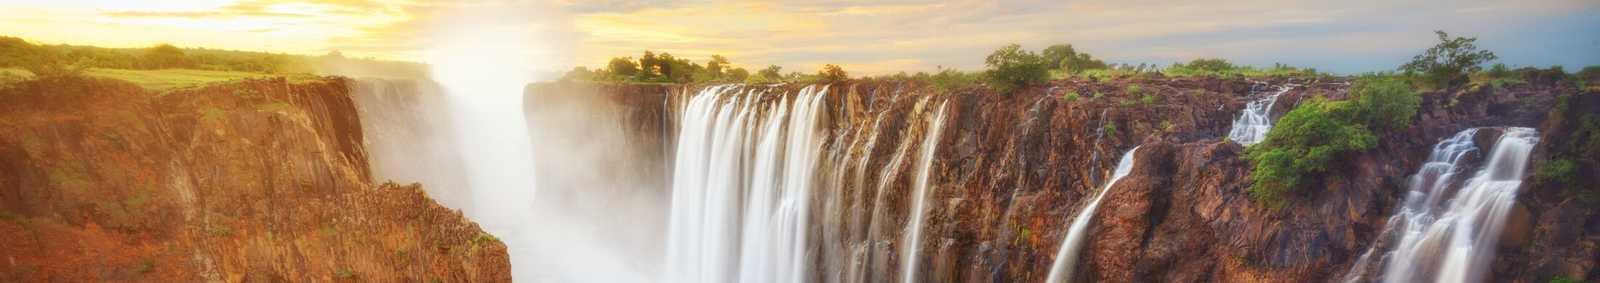 waterfall, Africa